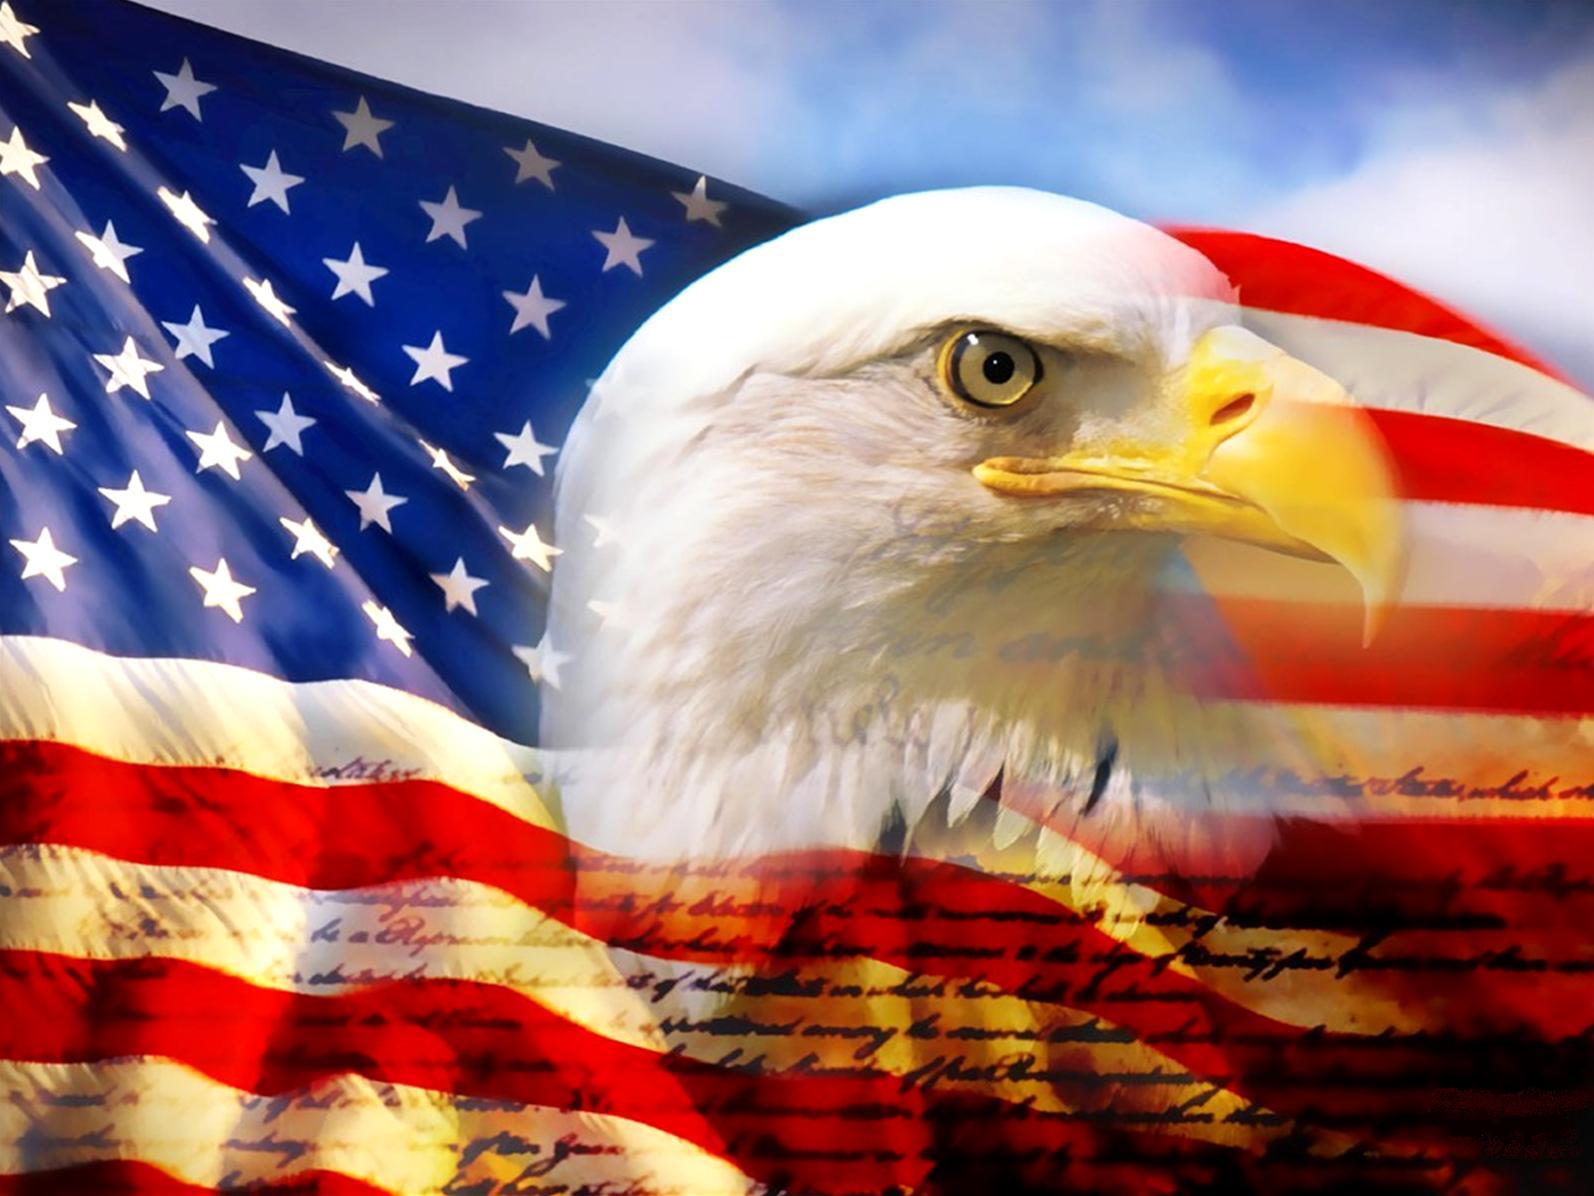 moleskinex19 The American Flag 1594x1196